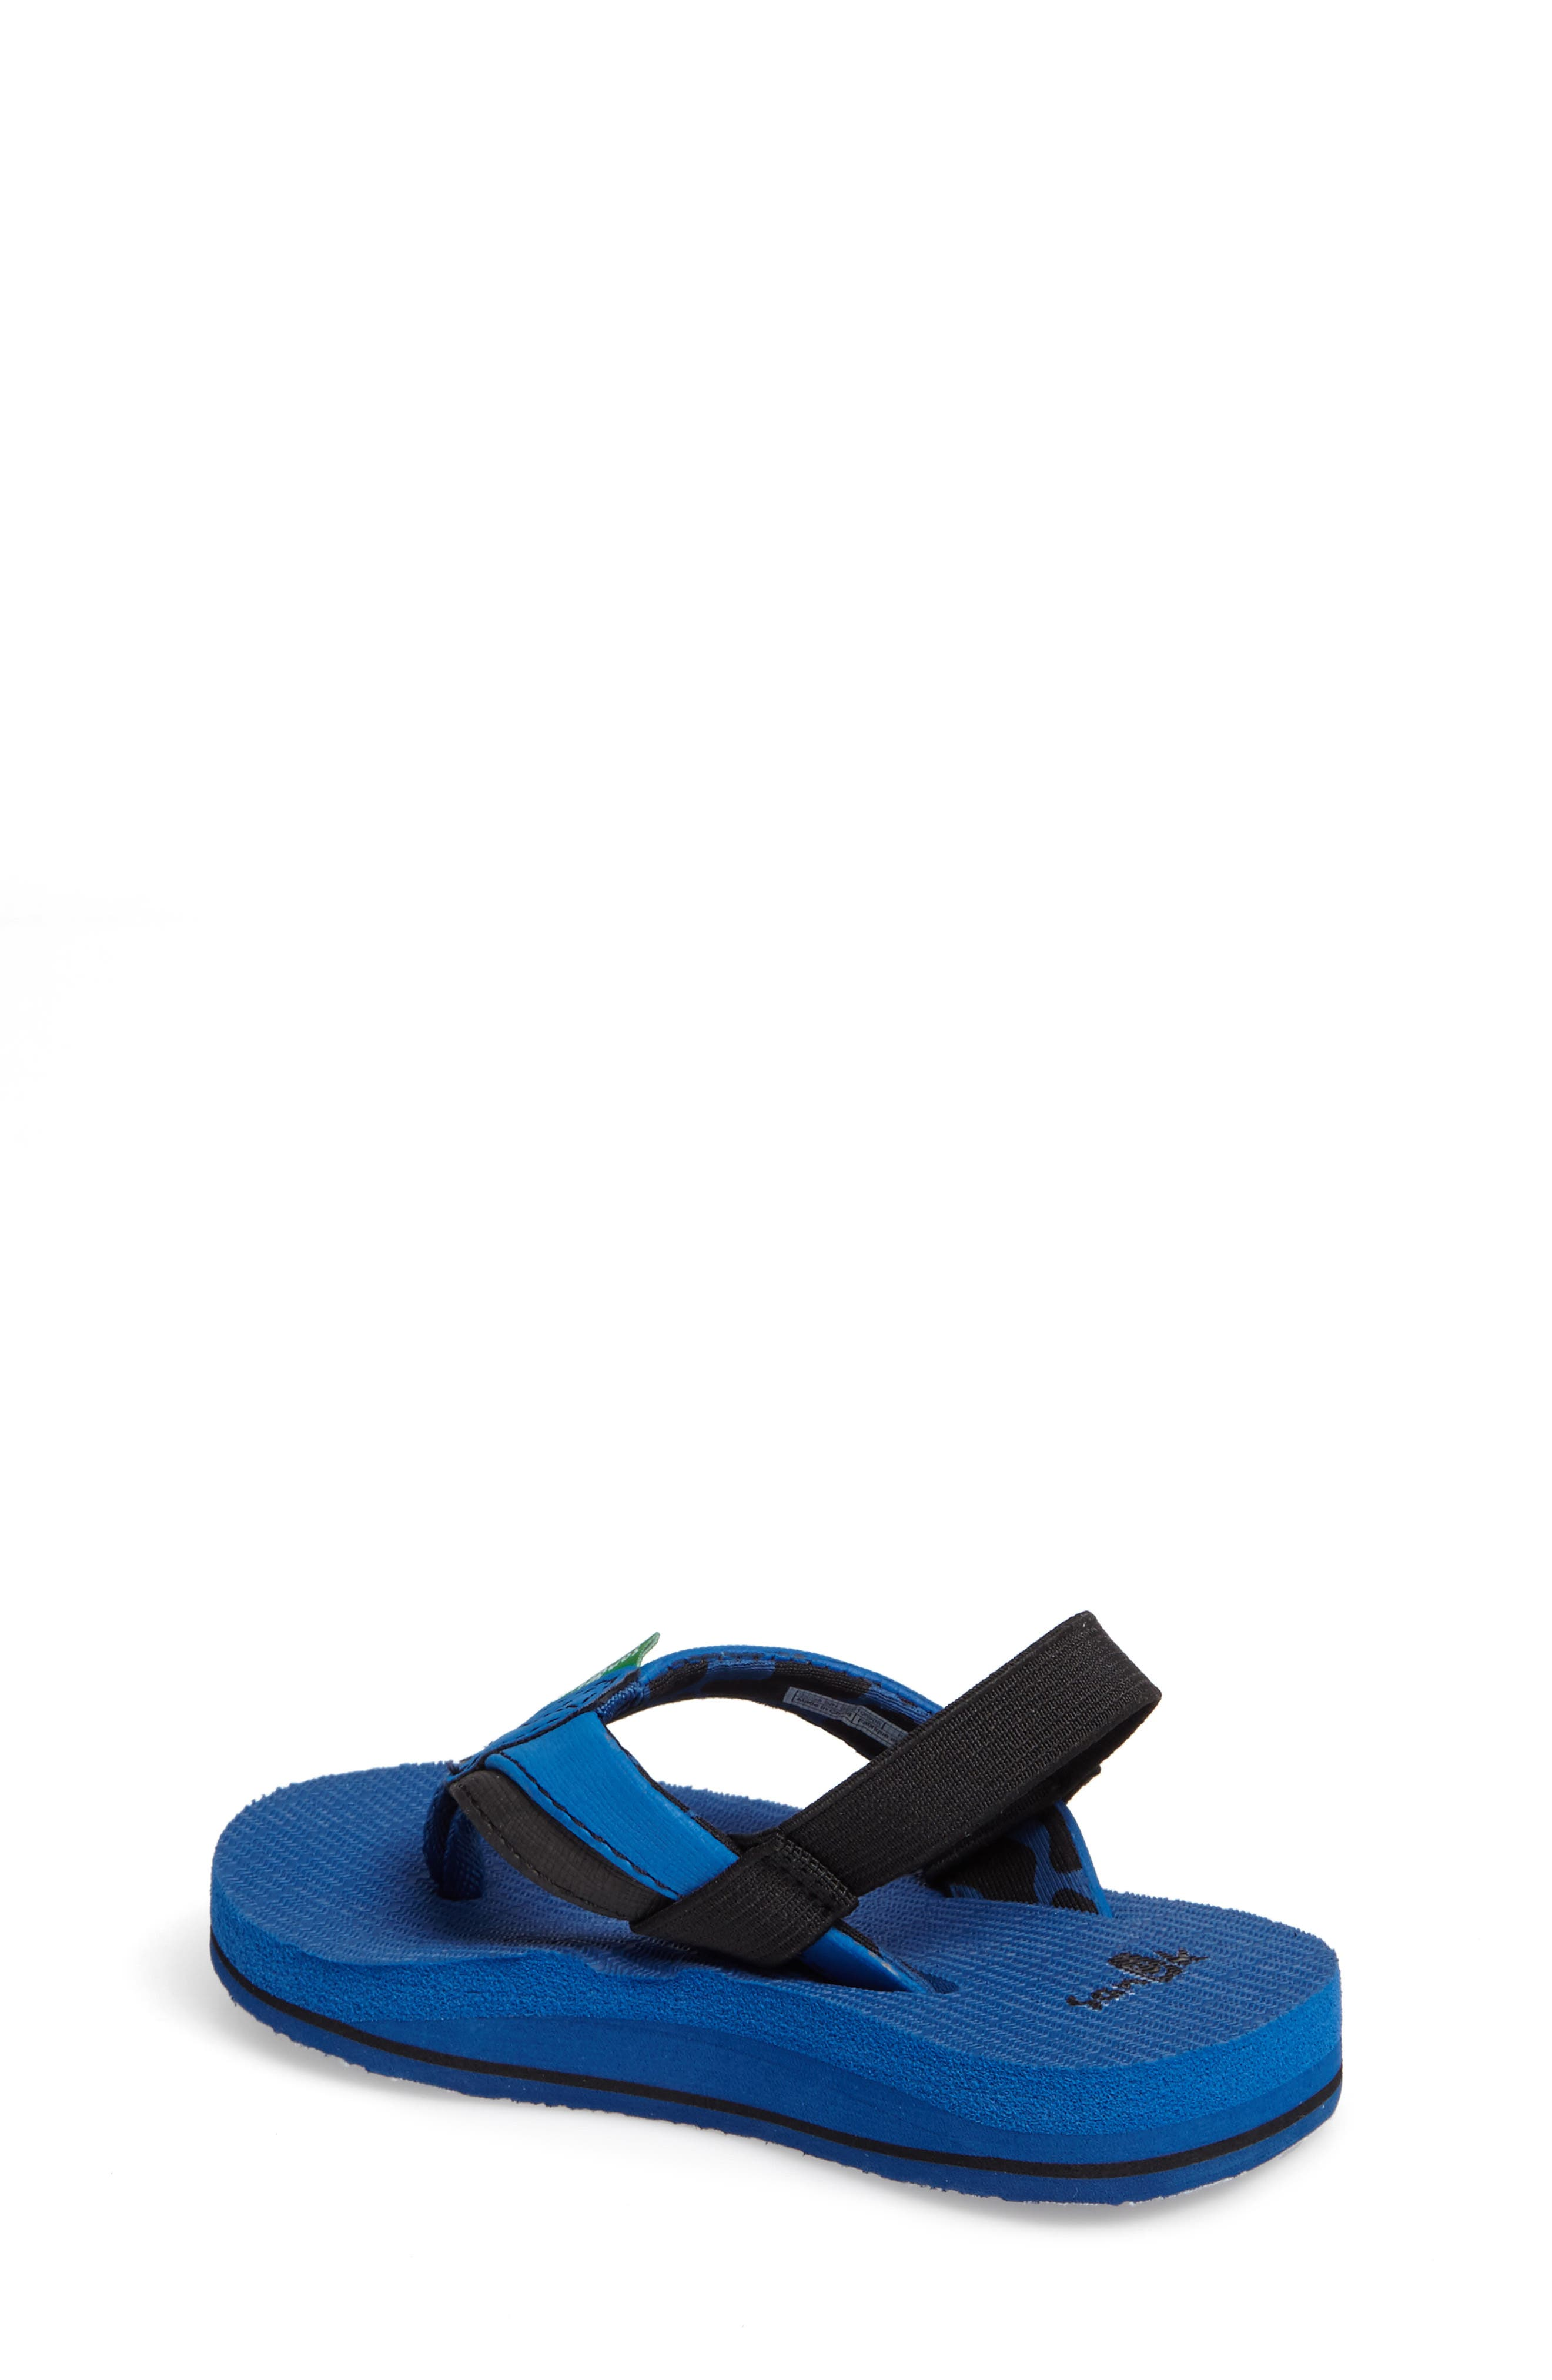 'Rootbeer Cozy' Lightweight Flip Flop Sandal,                             Alternate thumbnail 8, color,